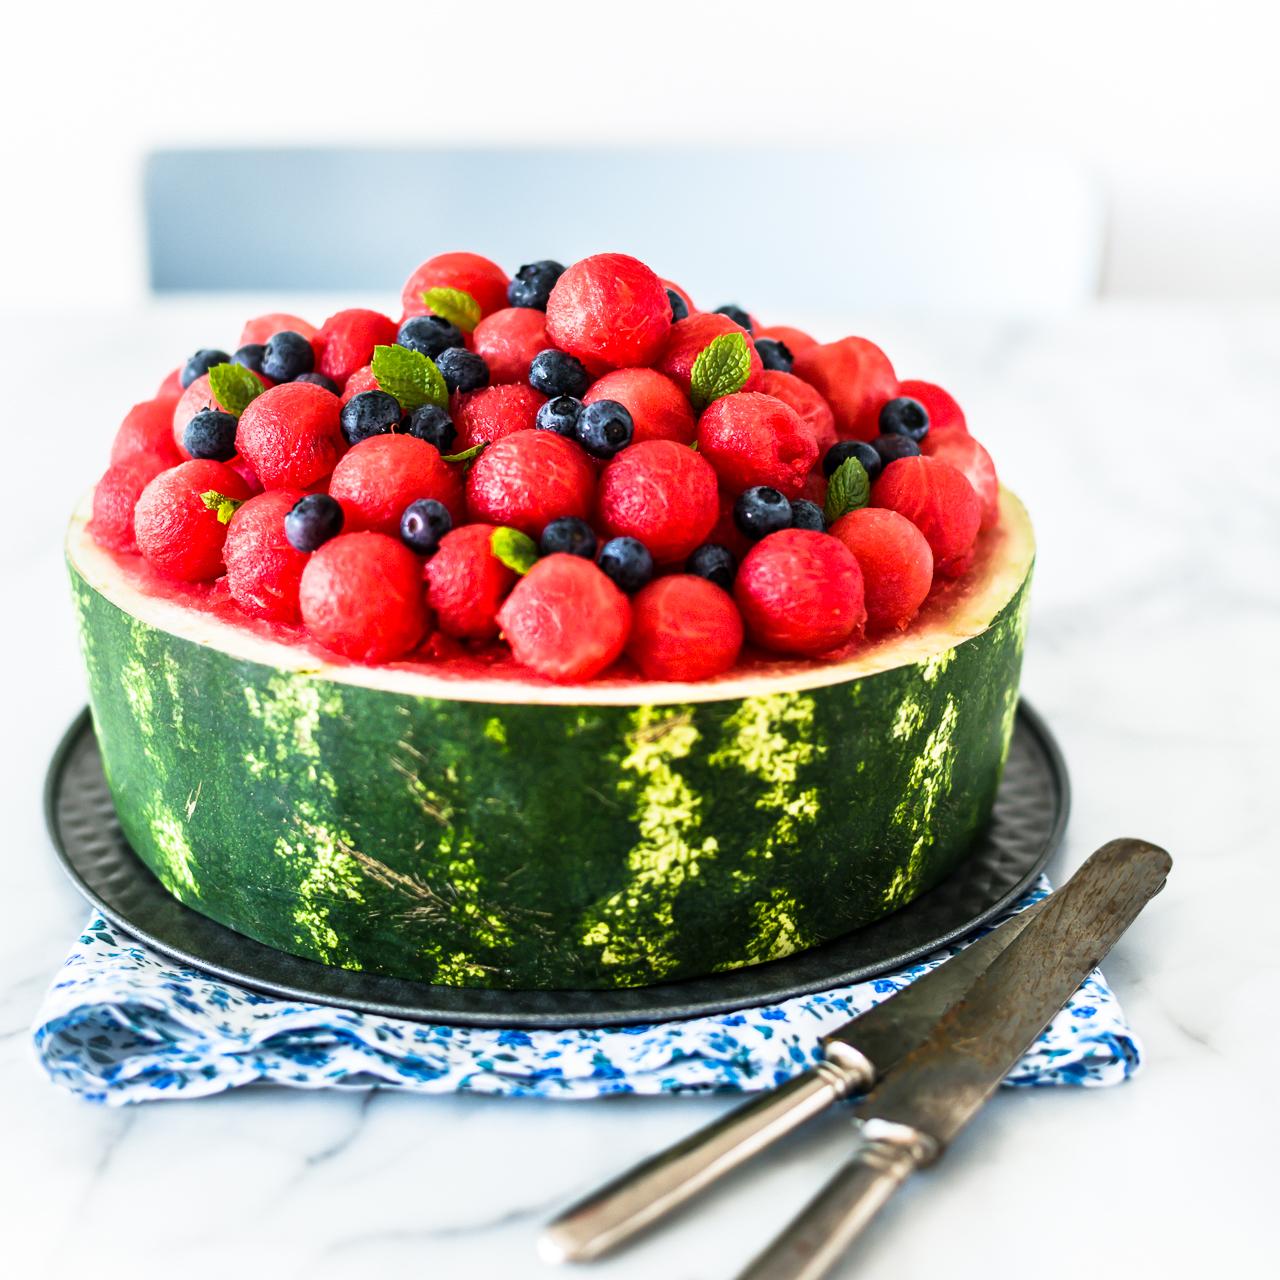 torta di anguria - watermelon cake